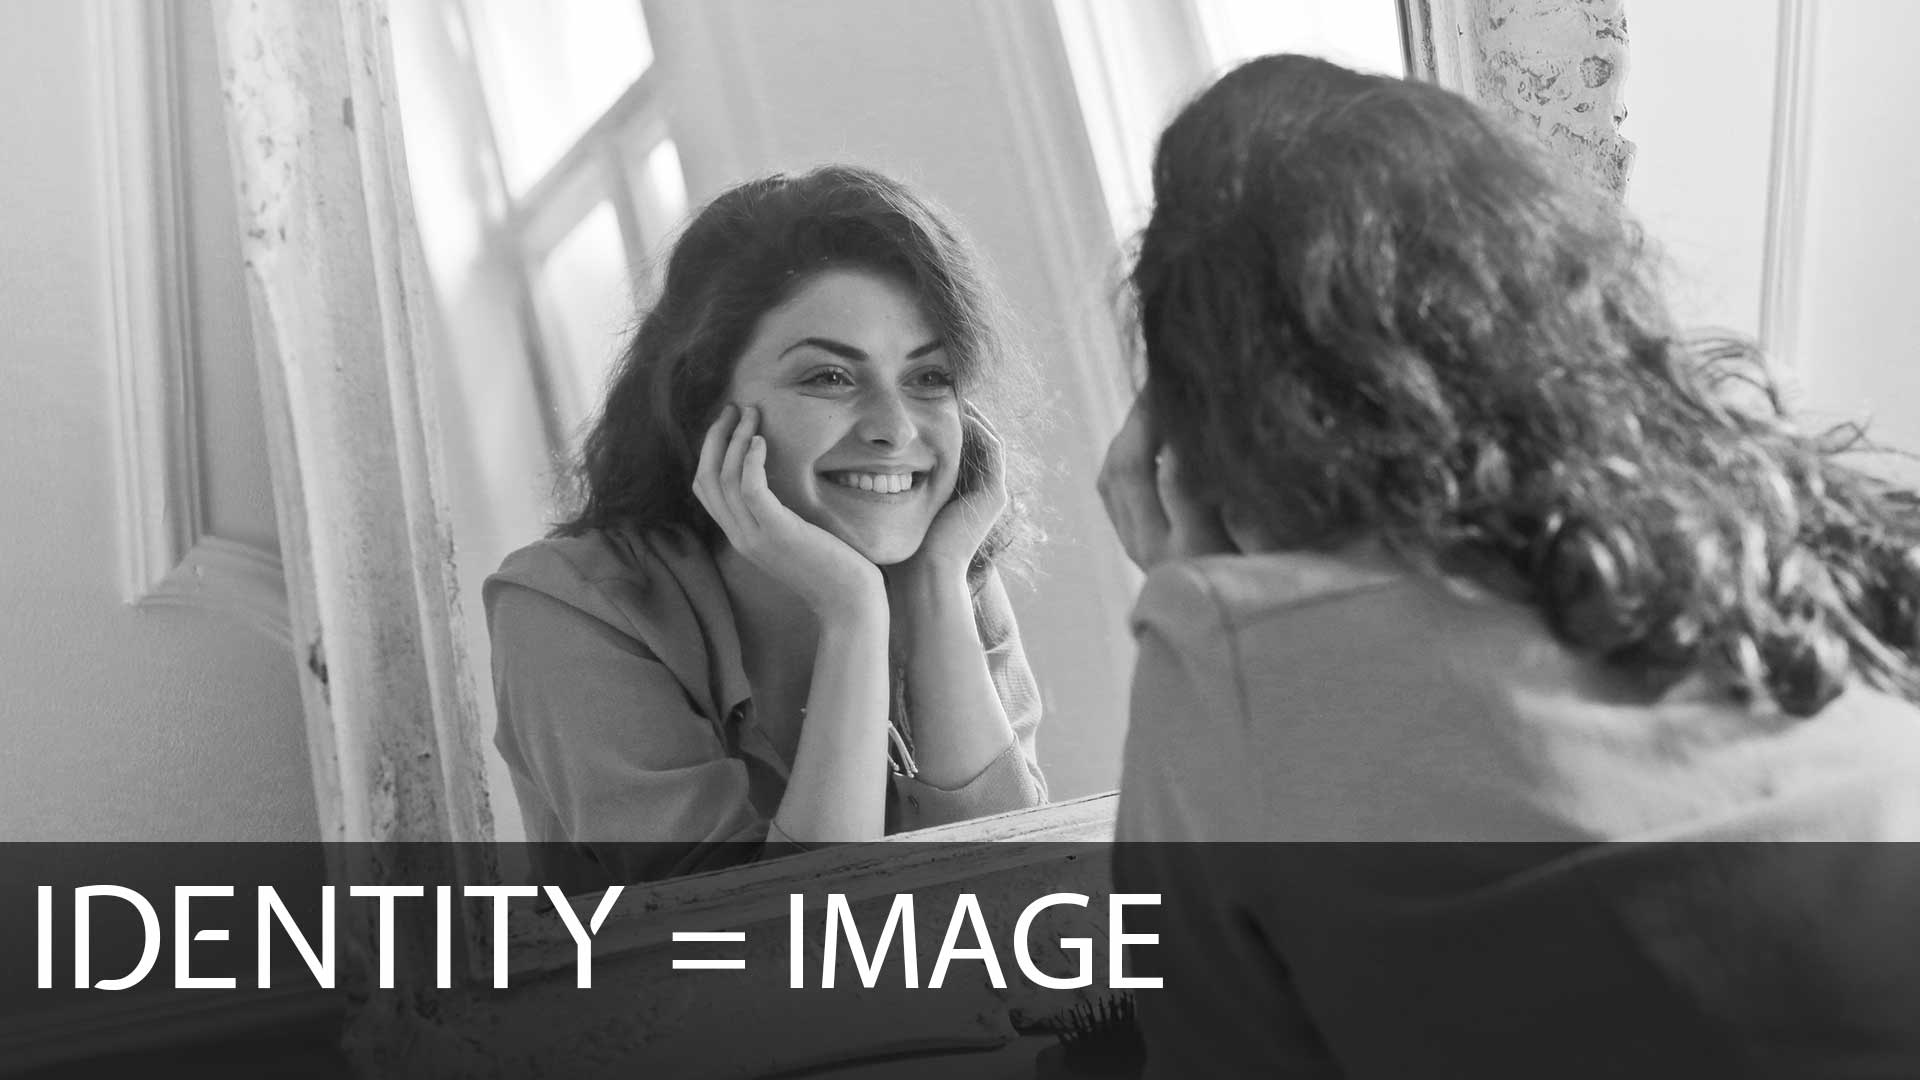 image relates to identity